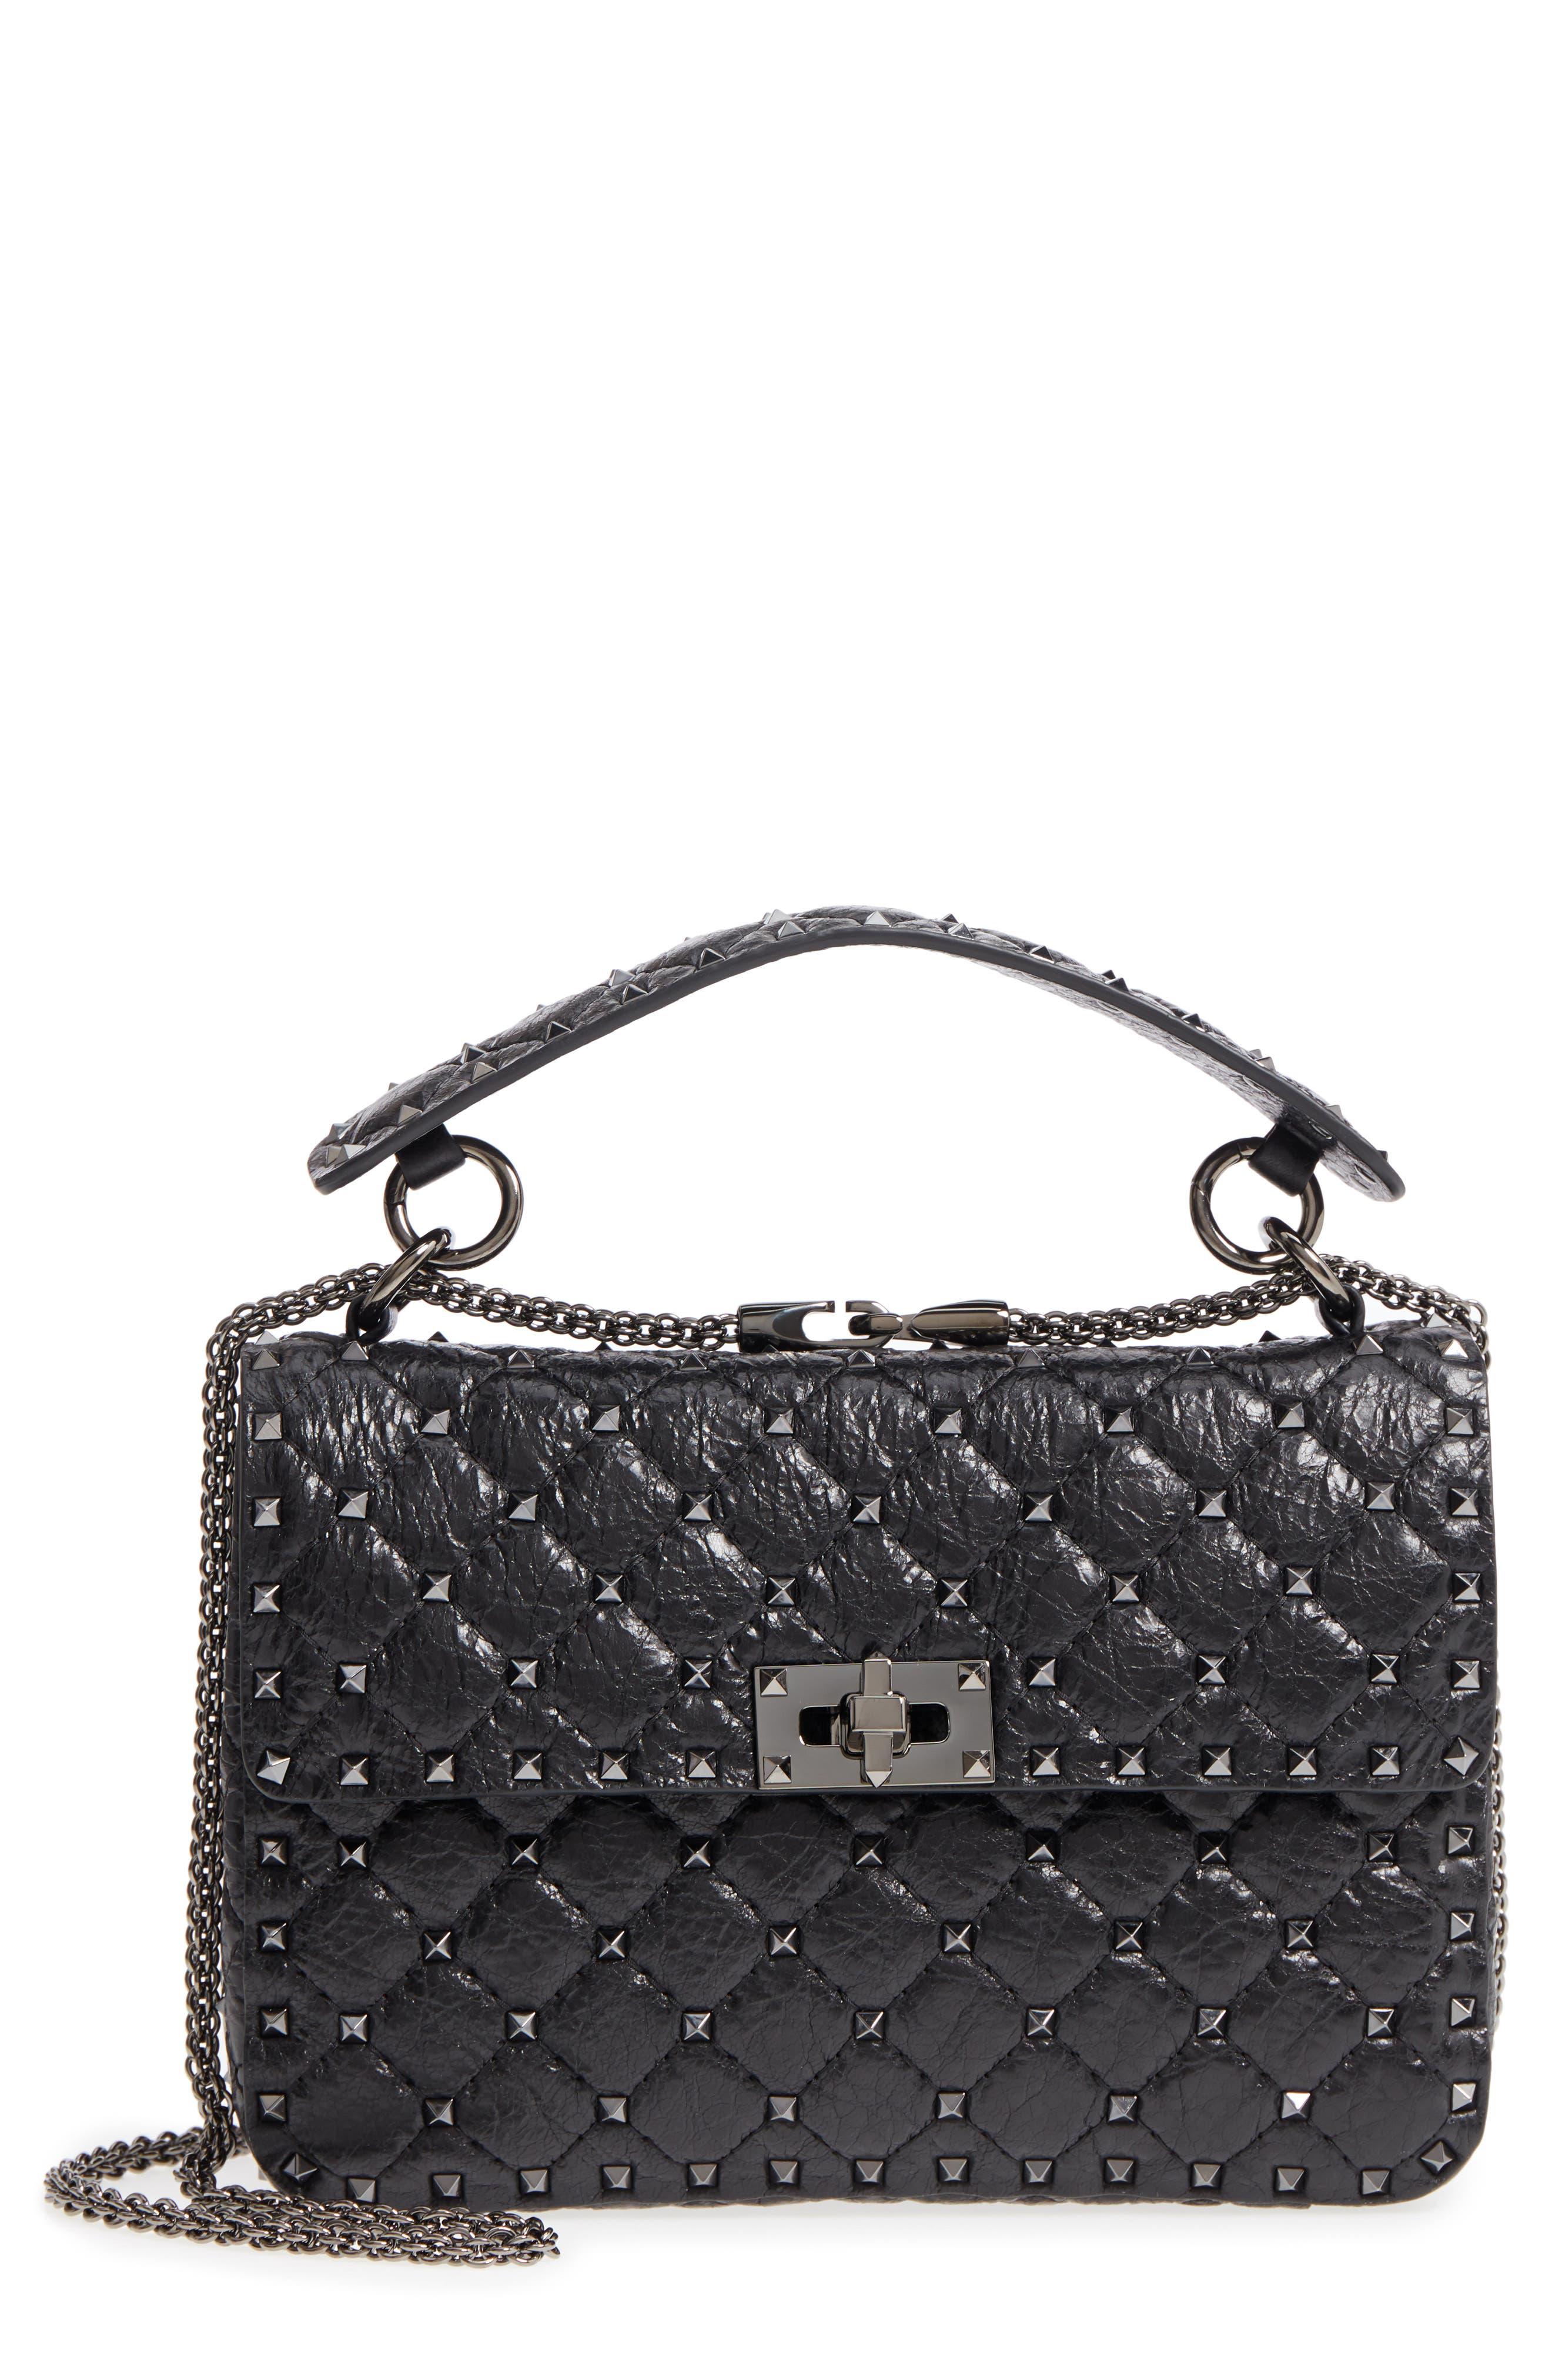 Vitello Rockstud Lambskin Leather Shoulder Bag, Main, color, NERO